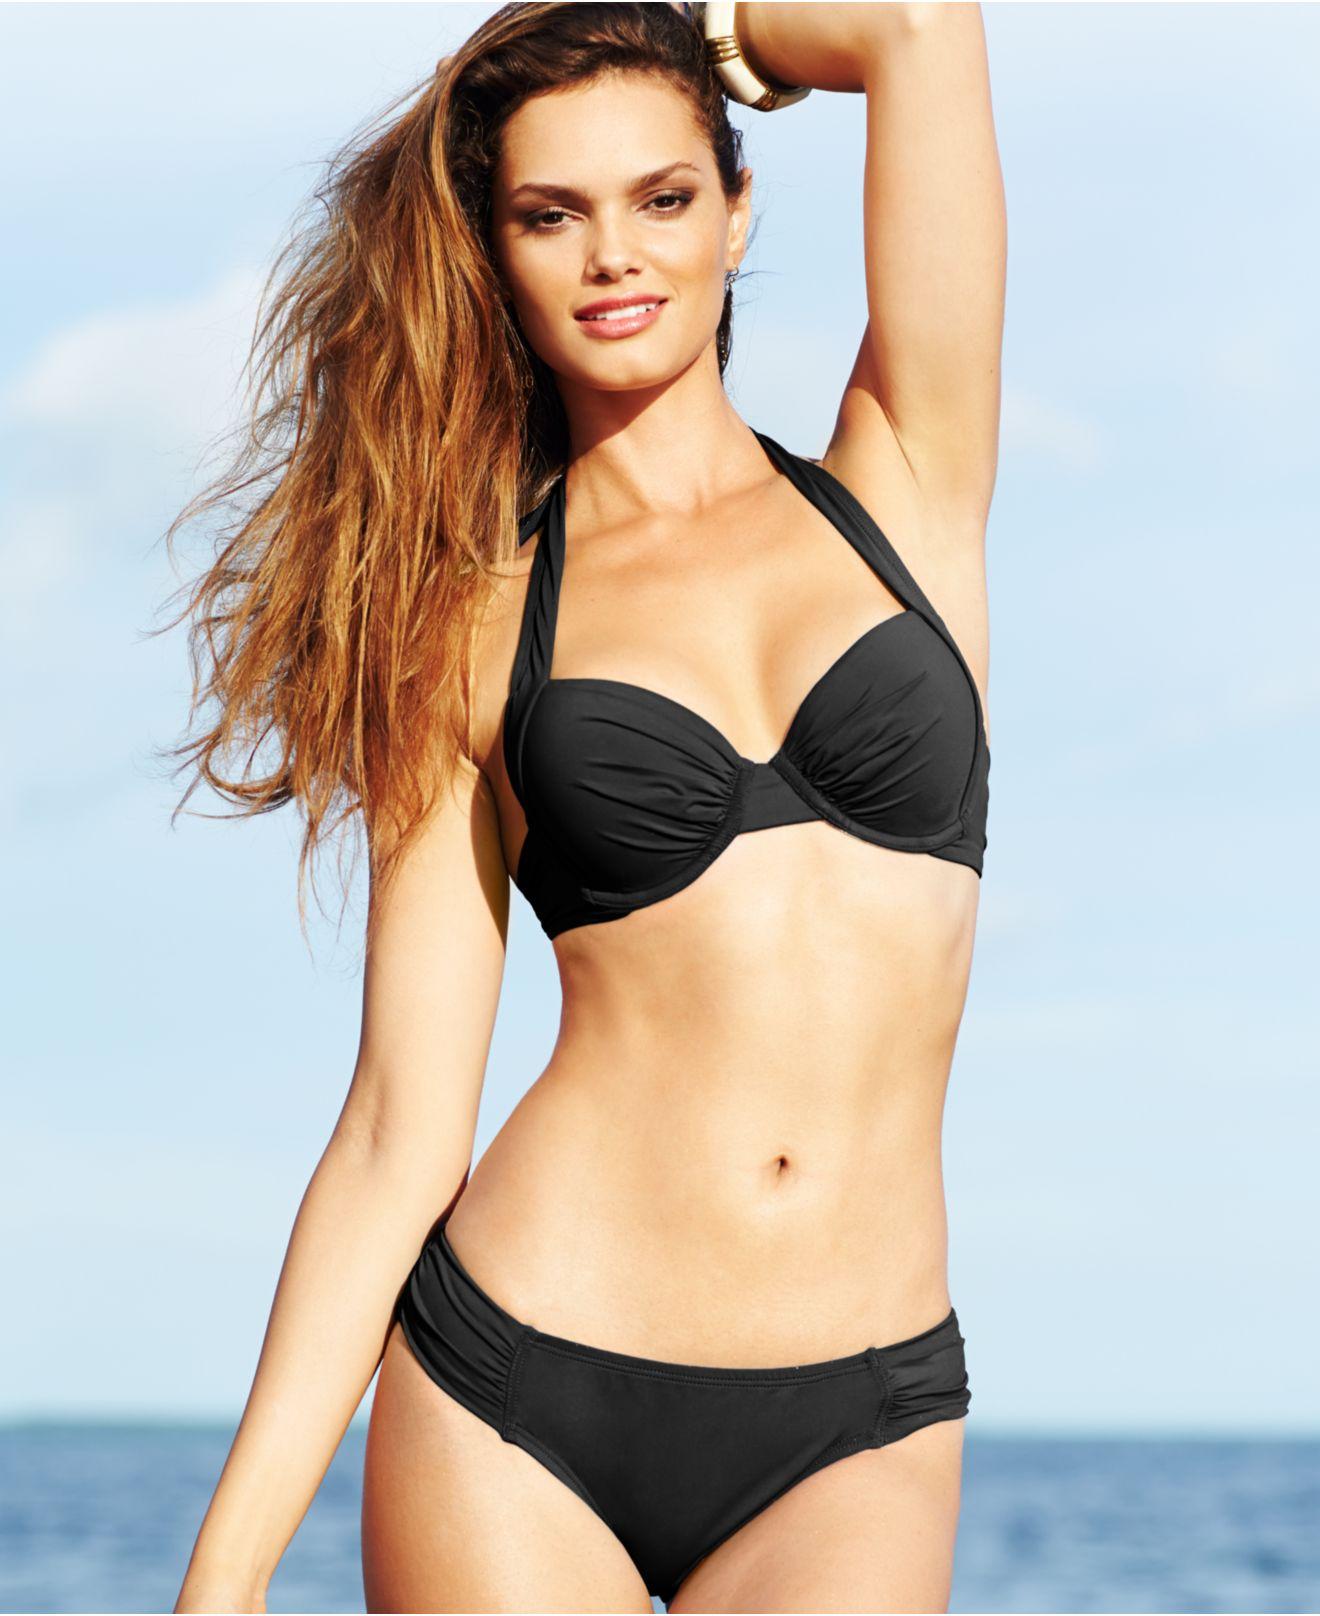 fc6c97f282f5a Tommy Bahama Bra-sized Underwire Halter Bikini Top in Black - Lyst